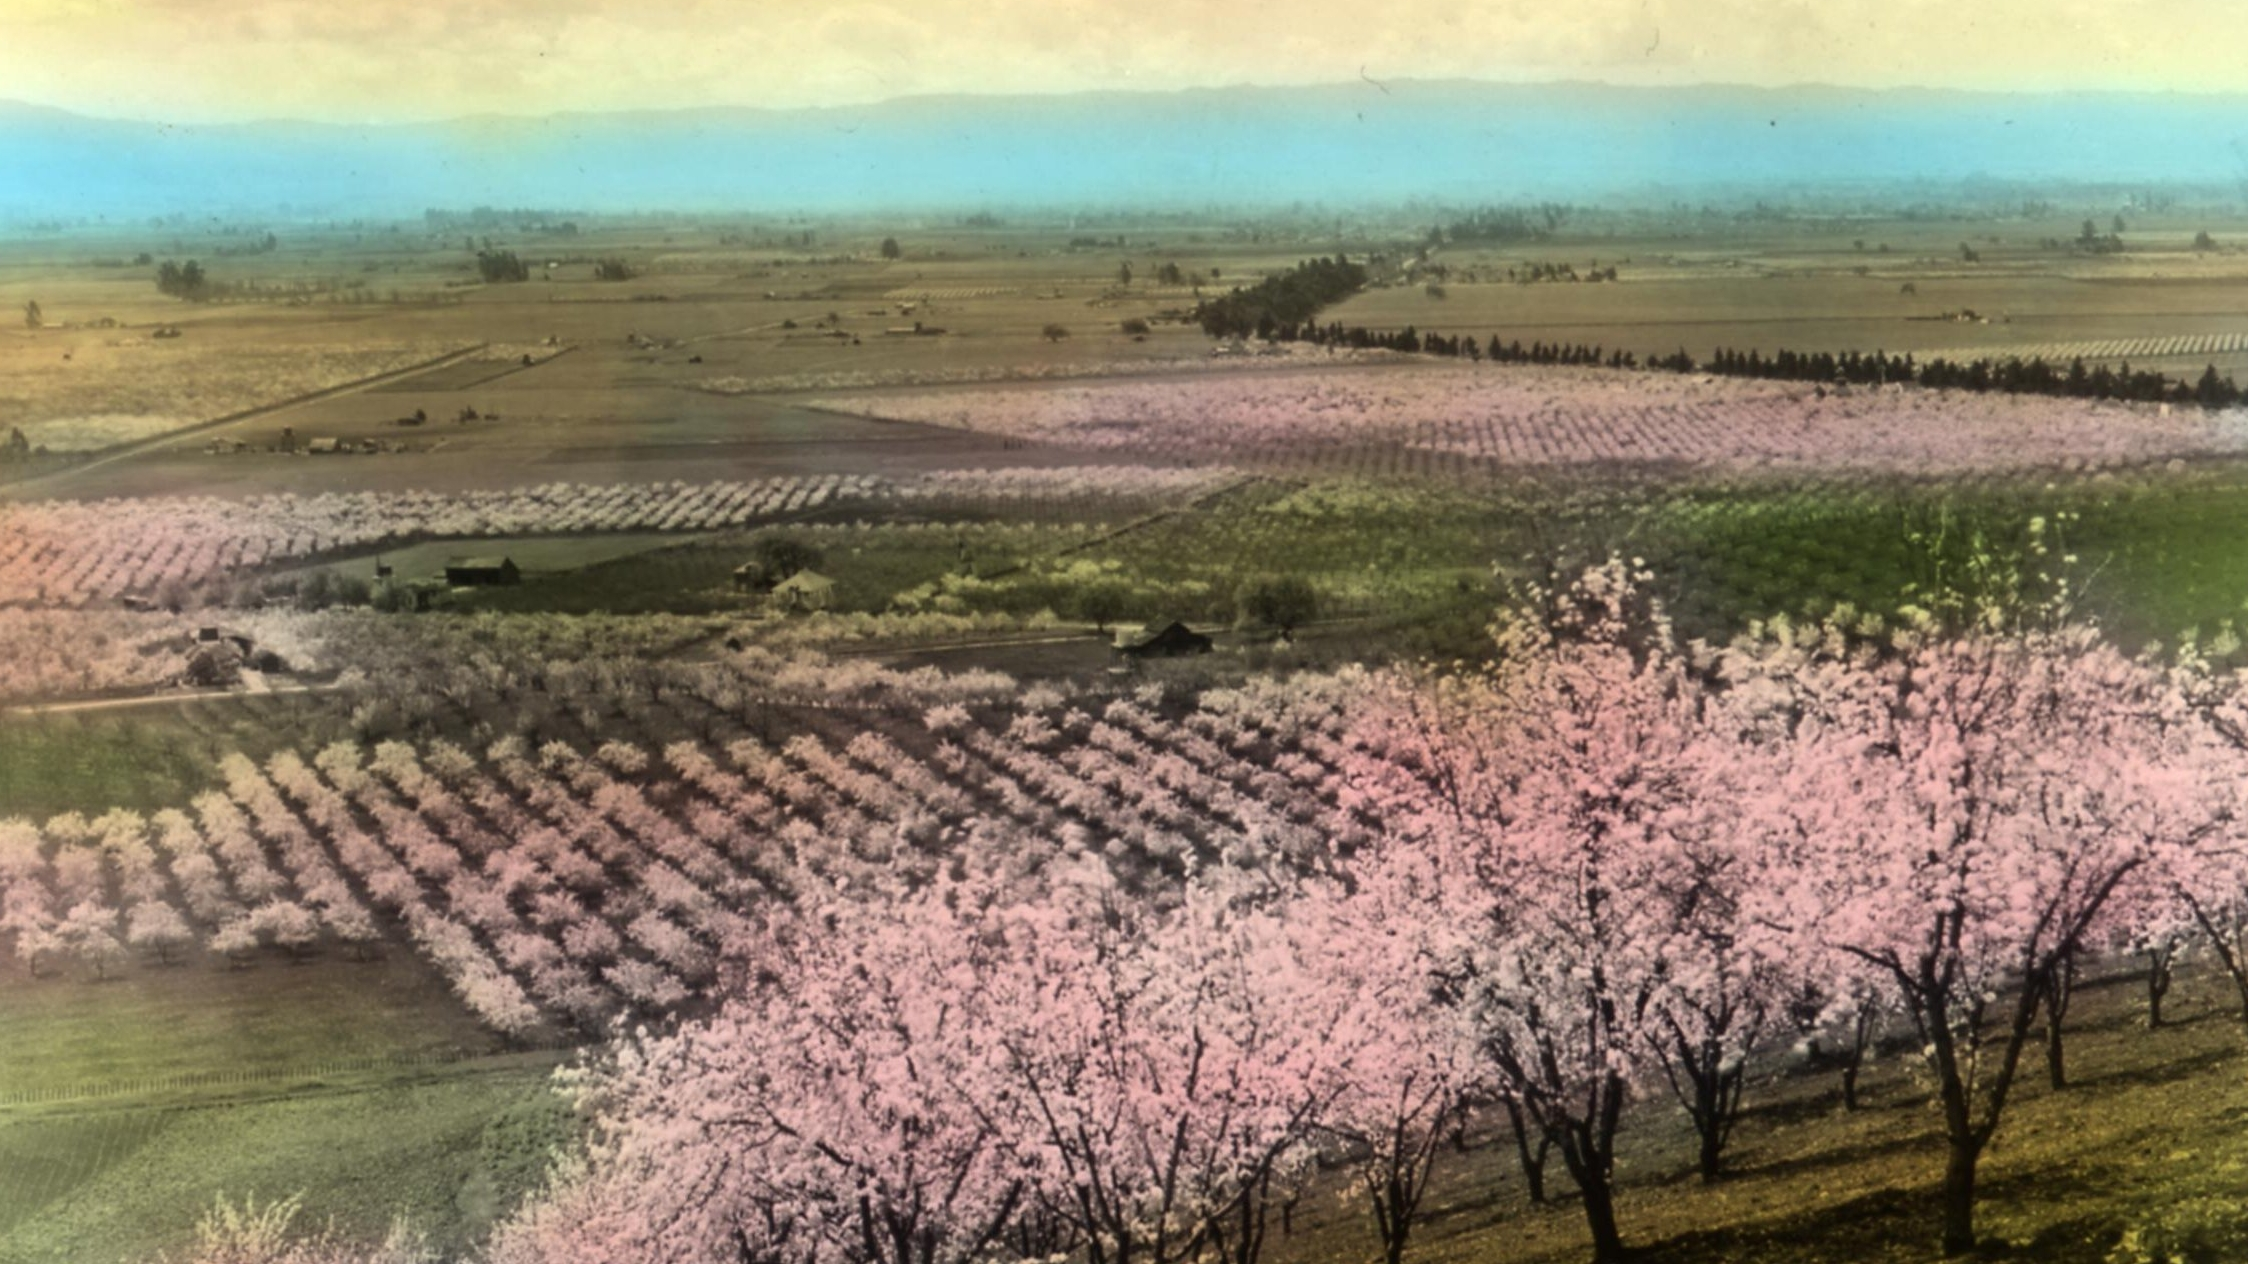 Santa Clara Valley Prune_Orchard_near_Santa_Clara,_California_(3655751146).jpg